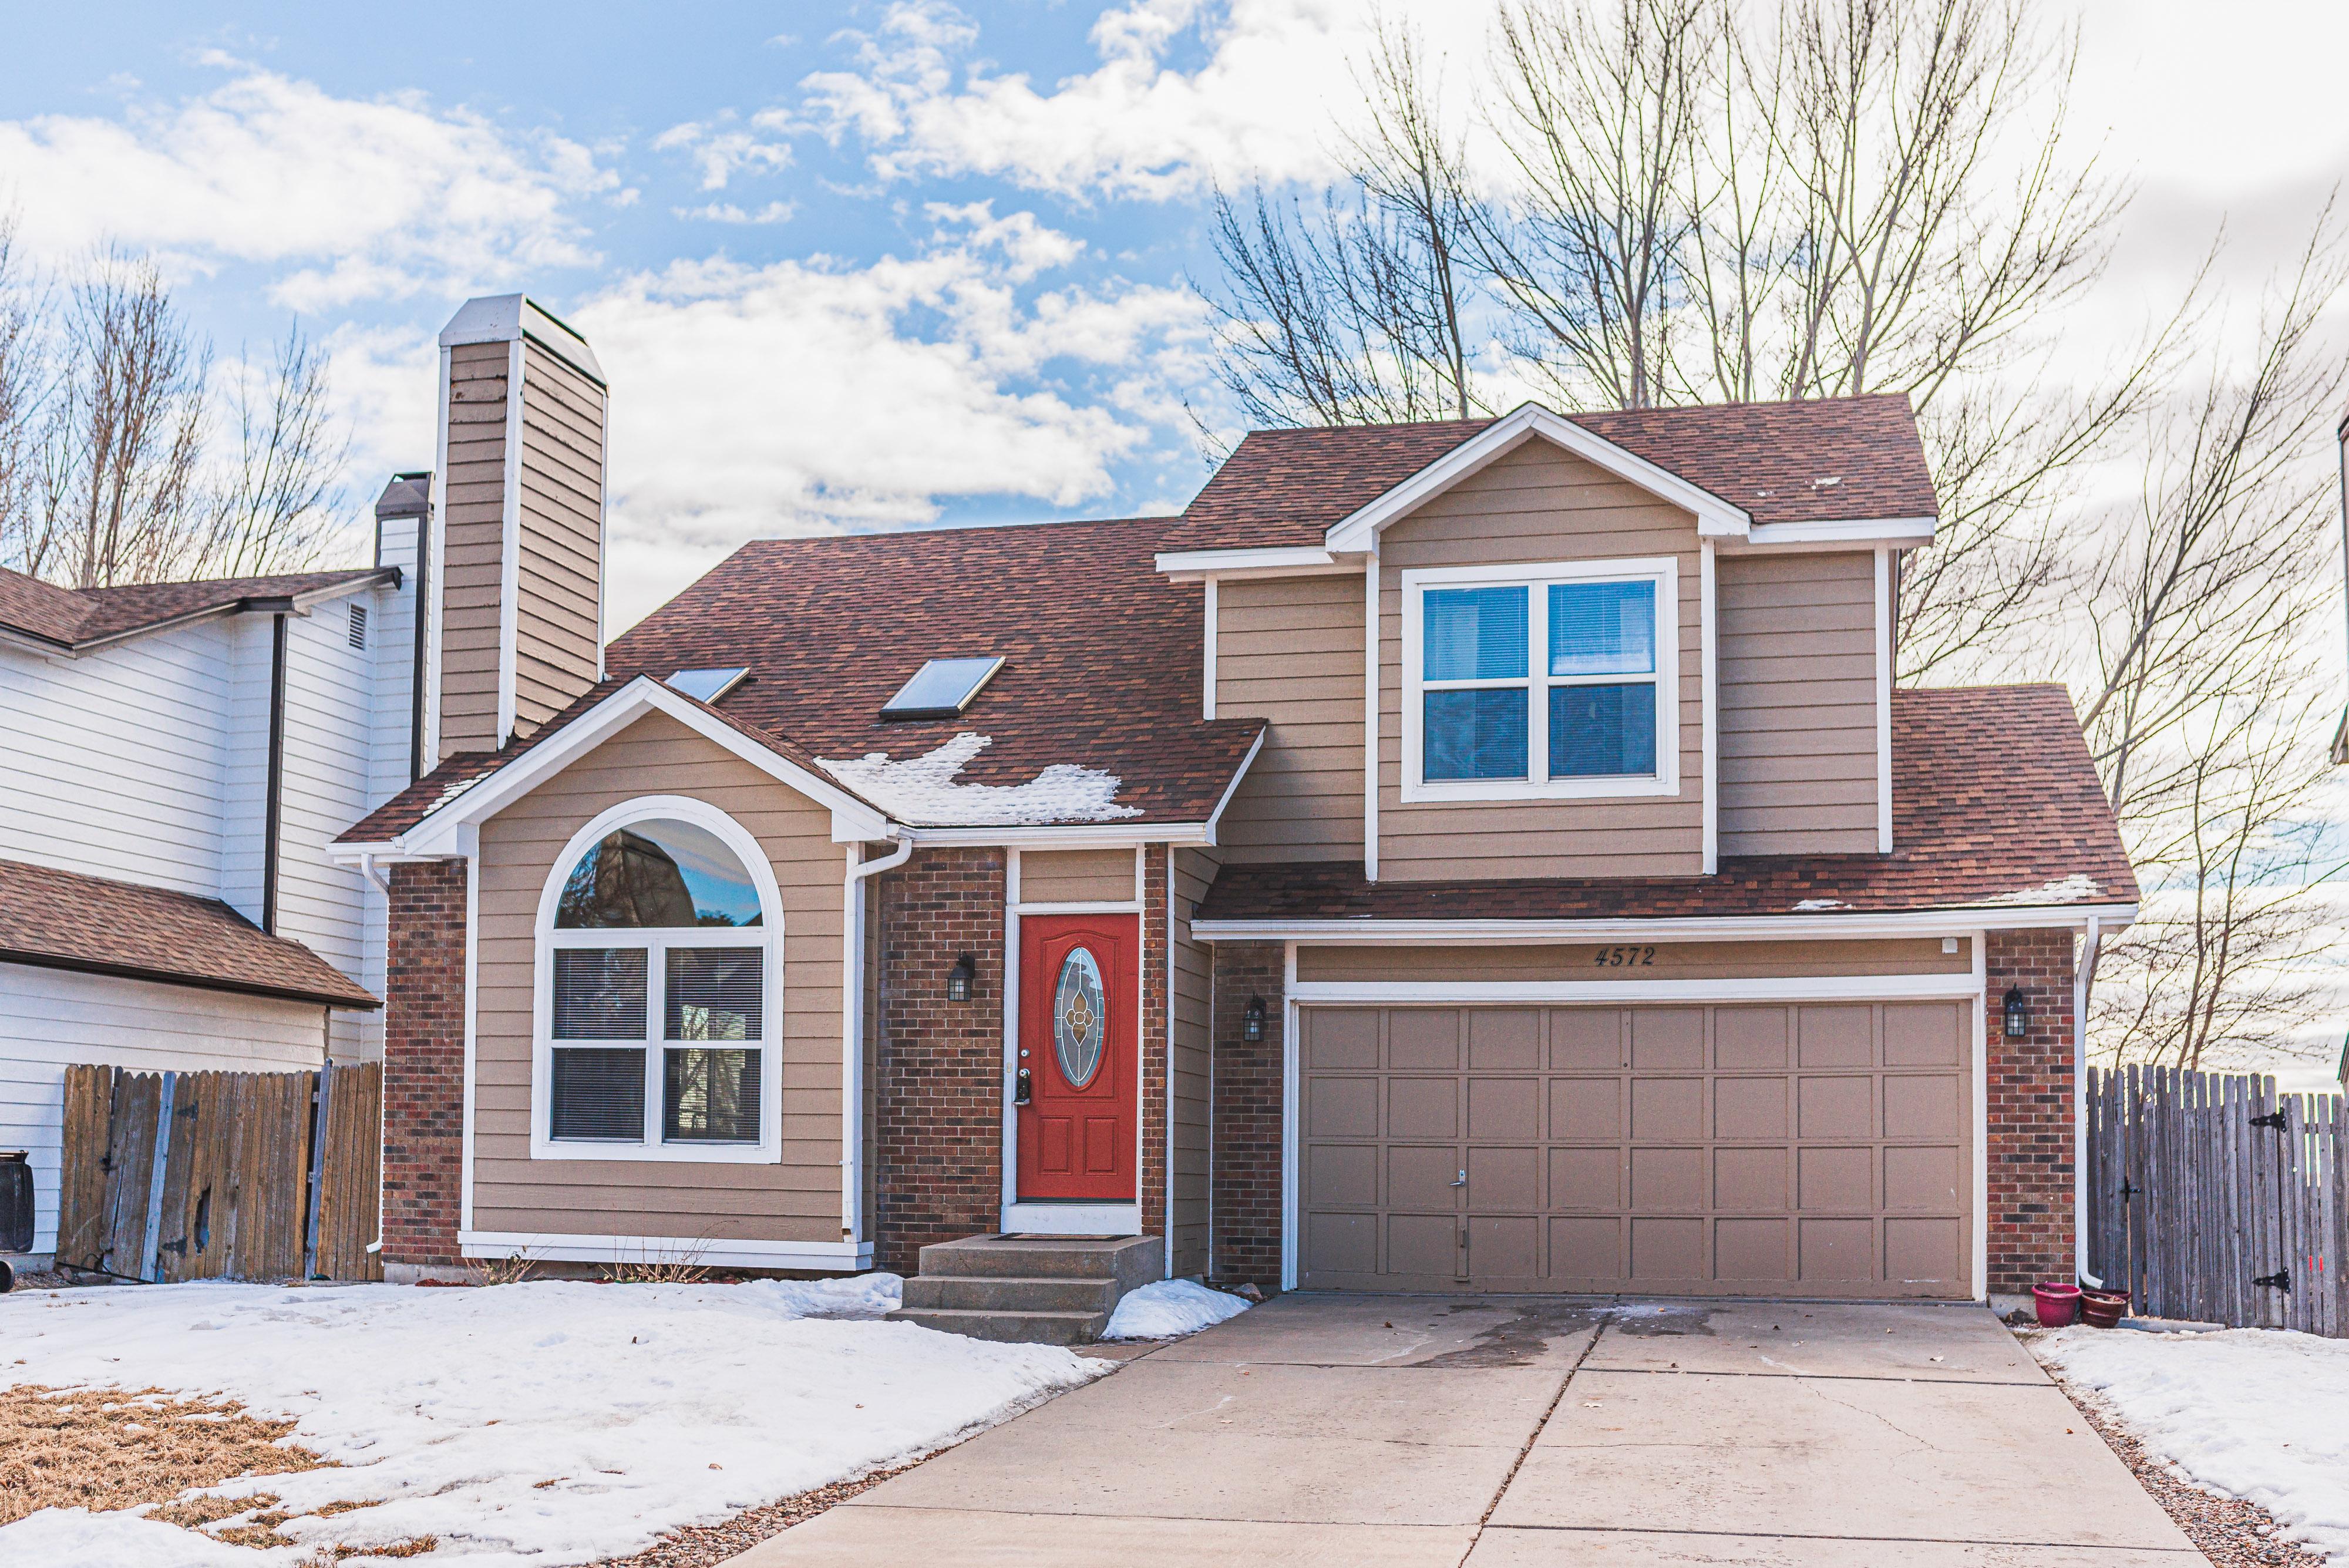 single family homes Colorado Springs, CO/available single family homes Colorado Springs, CO